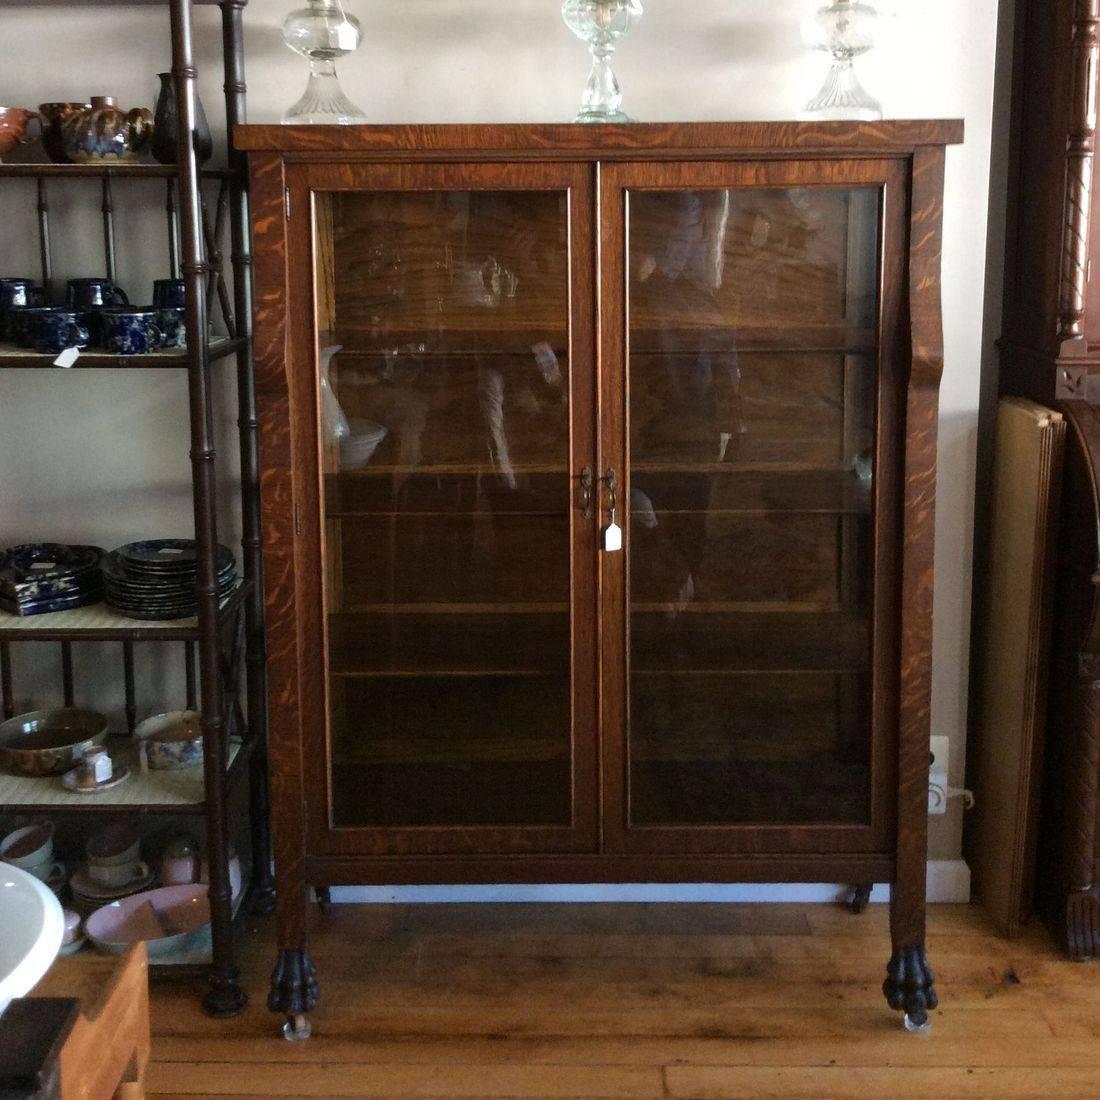 "C. 1910/1920's Oak 4-Shelf China Cabinet w/Claw Feet - 44-1/4""W x 16-1/2""D x 59""H.  $325.00"